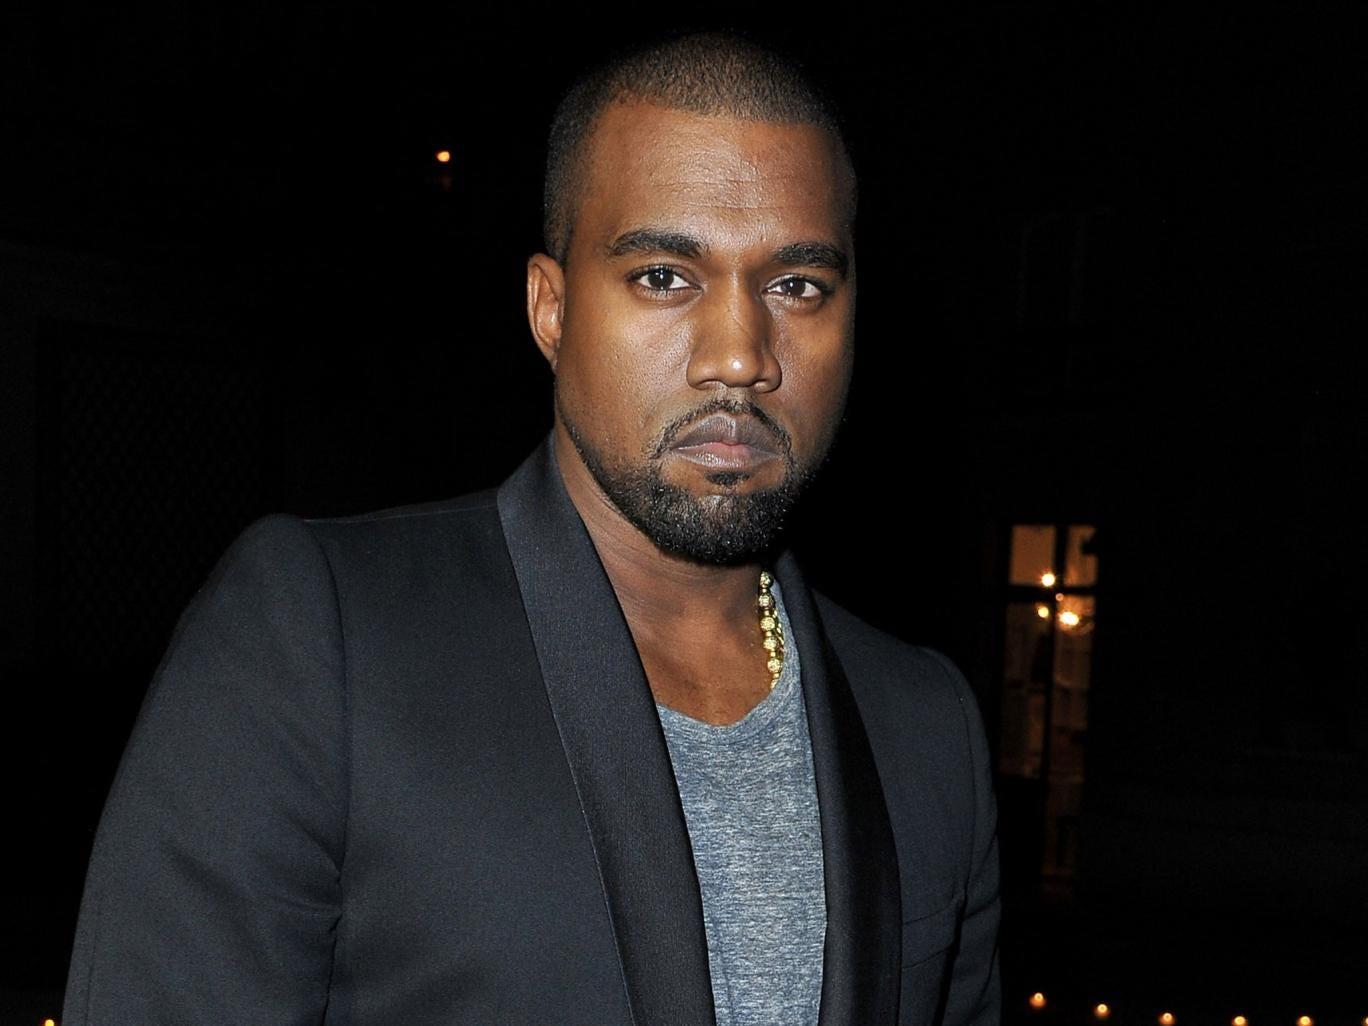 Kanye is writing a script with Brett Easton Ellis